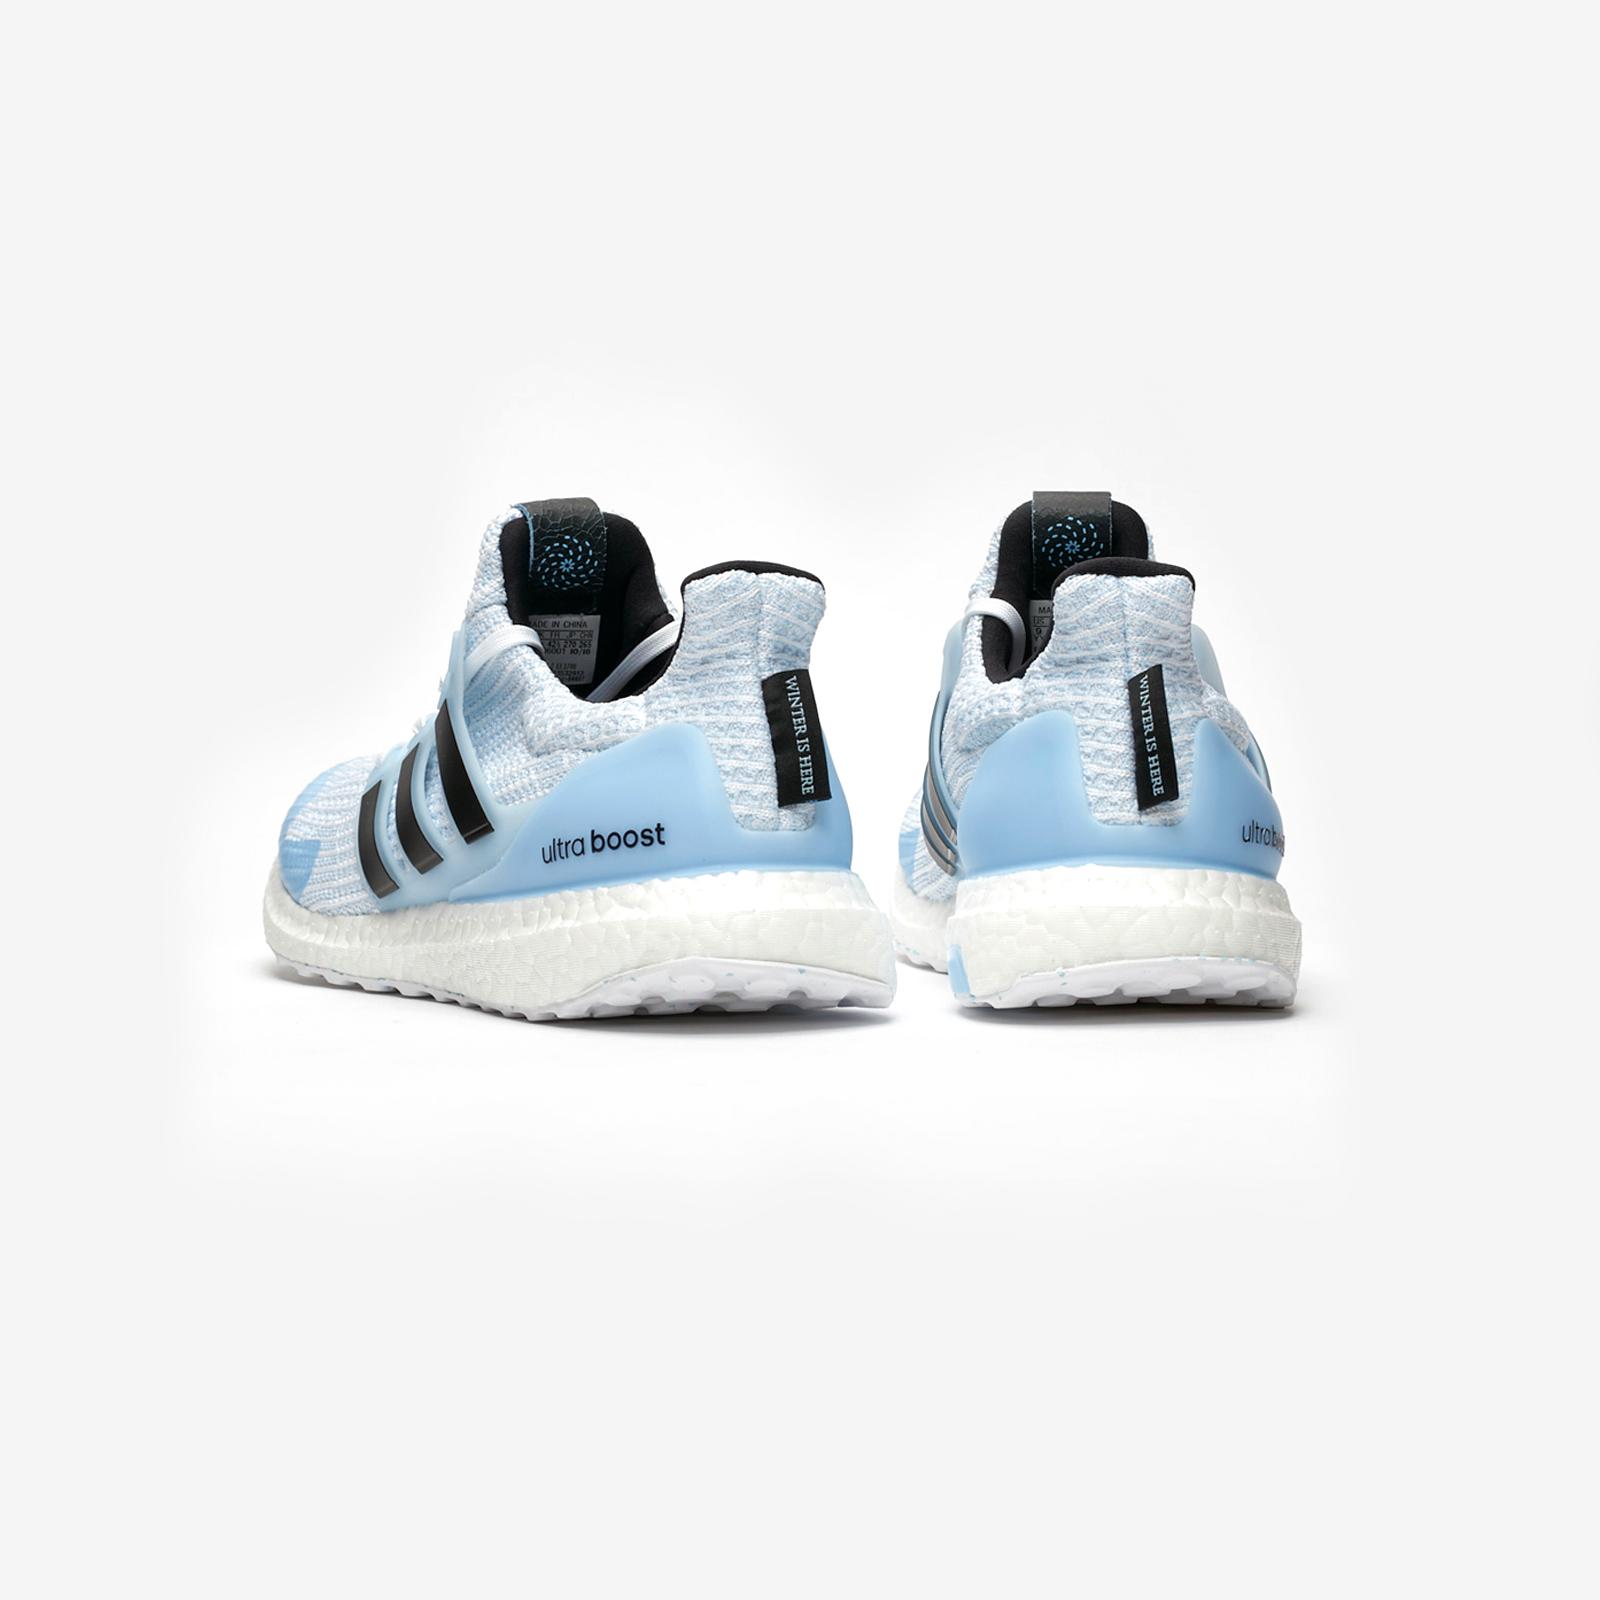 c439c6547ab3e adidas Ultraboost x Game of Thrones - Ee3708 - Sneakersnstuff ...